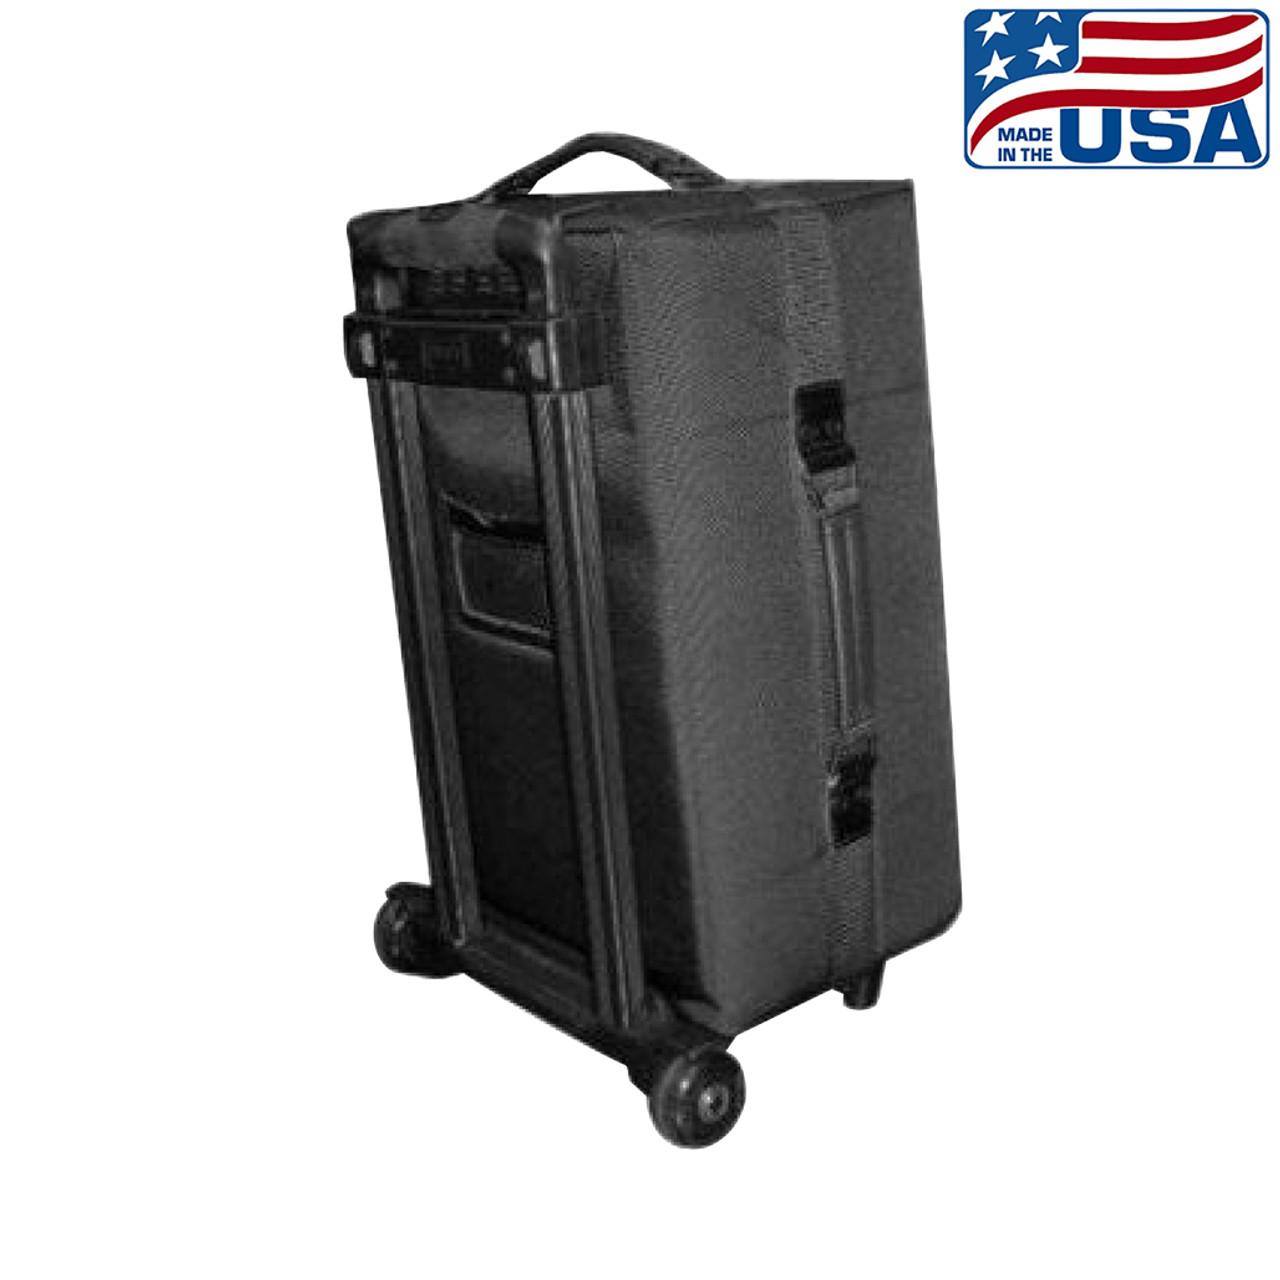 JEL-1620W: Padded Travel Case